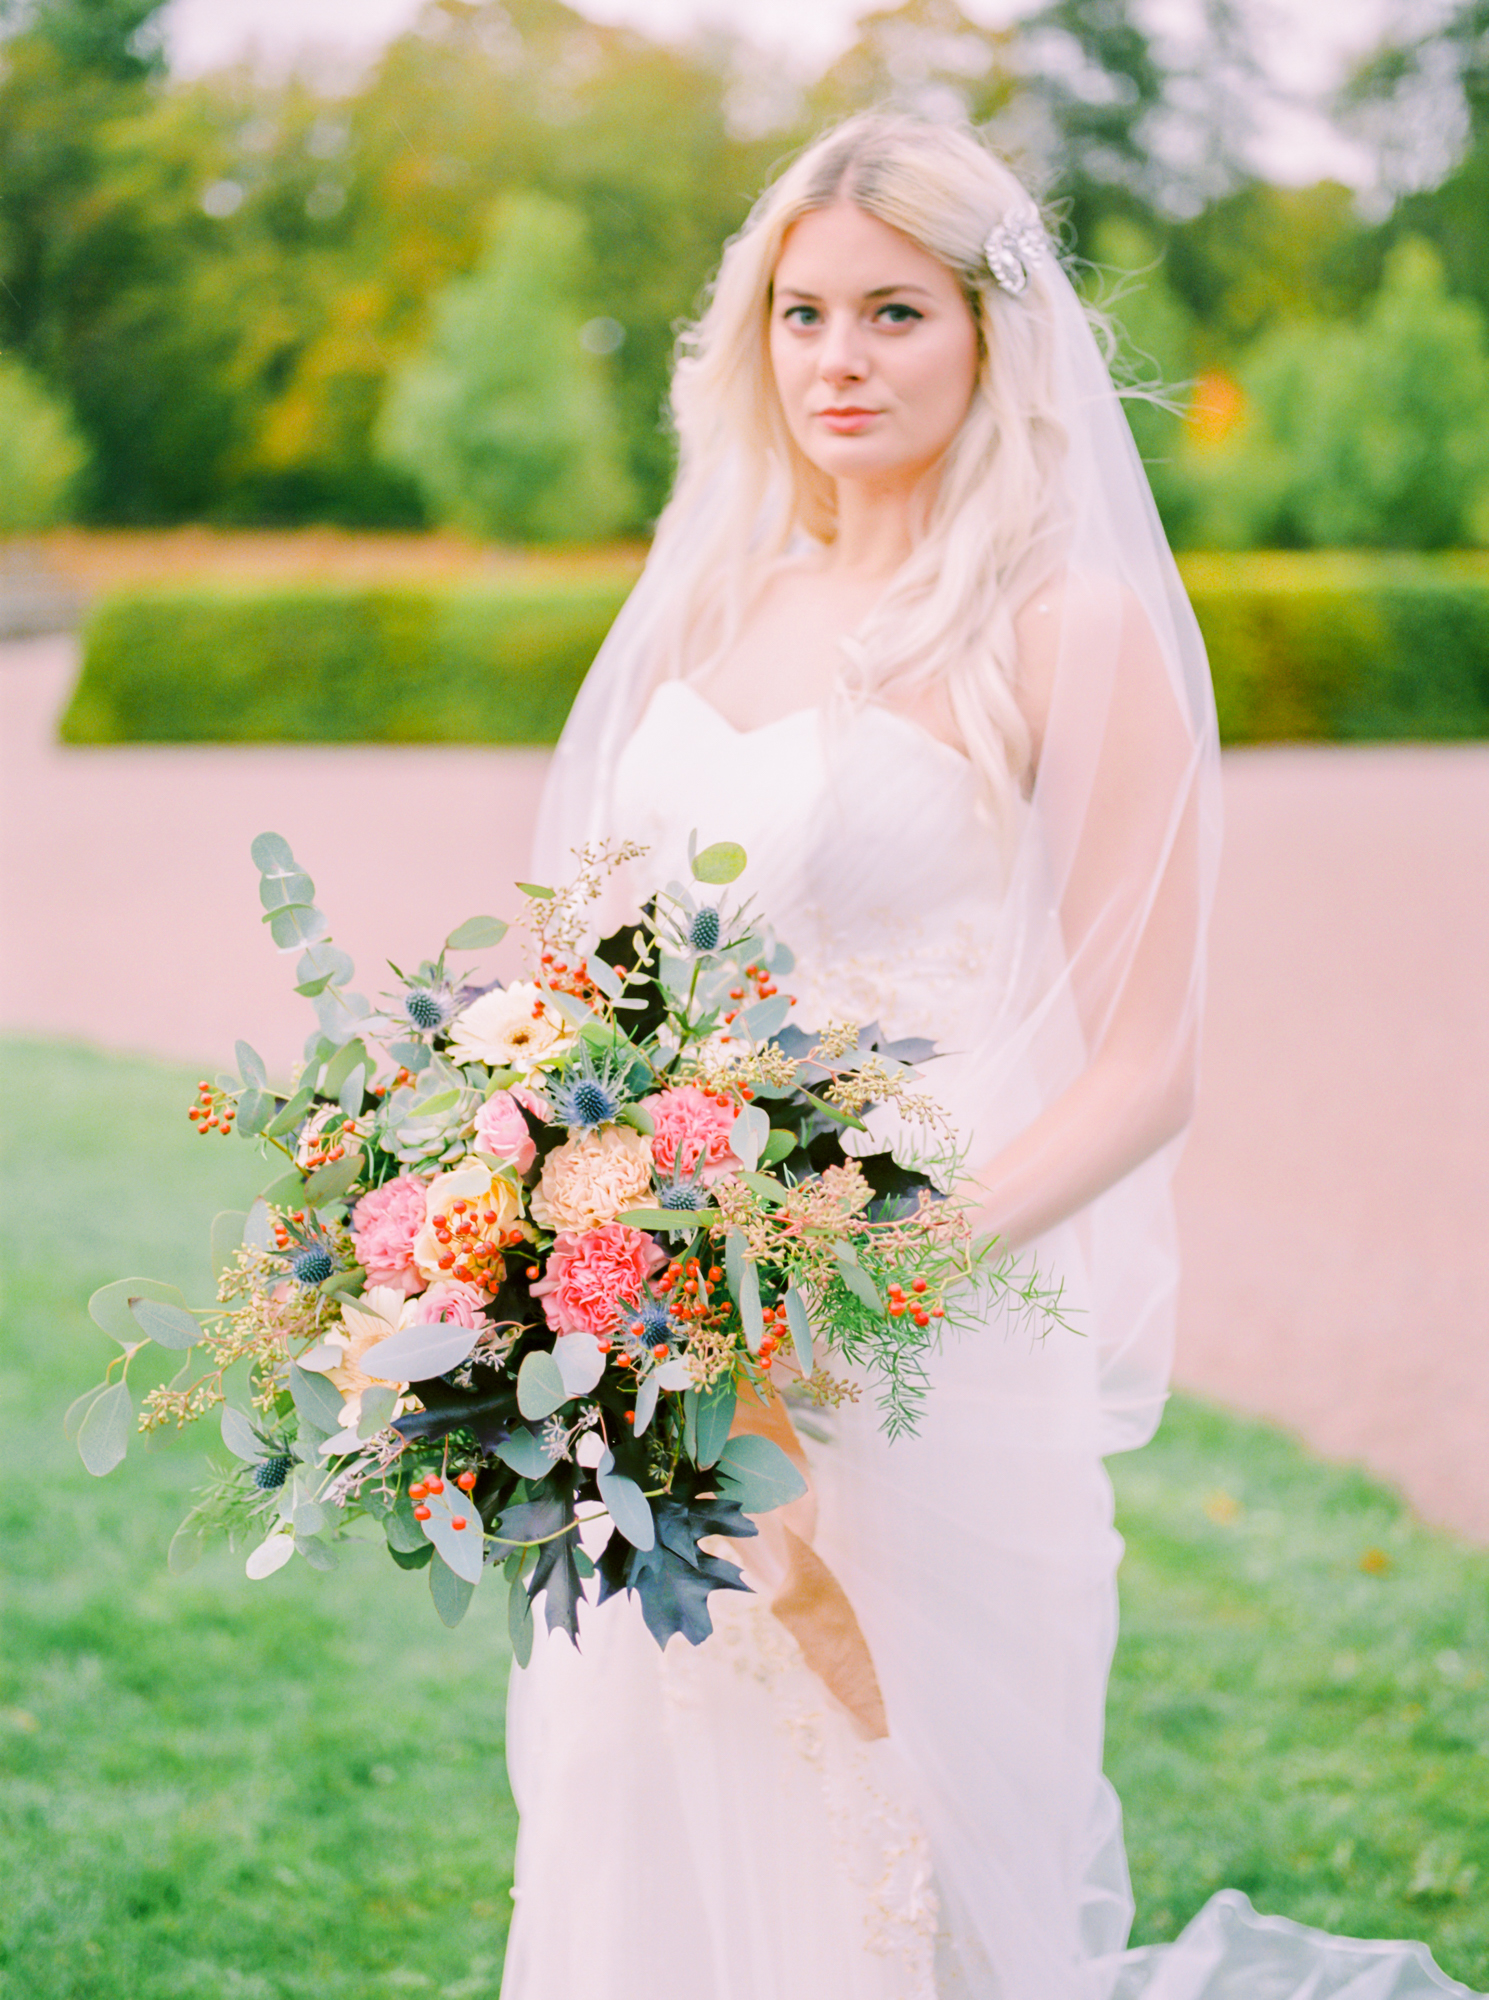 Elegant Organic Fall Swedish Bridal Wedding Styled Shoot - Erika Alvarenga Photography-88.jpg